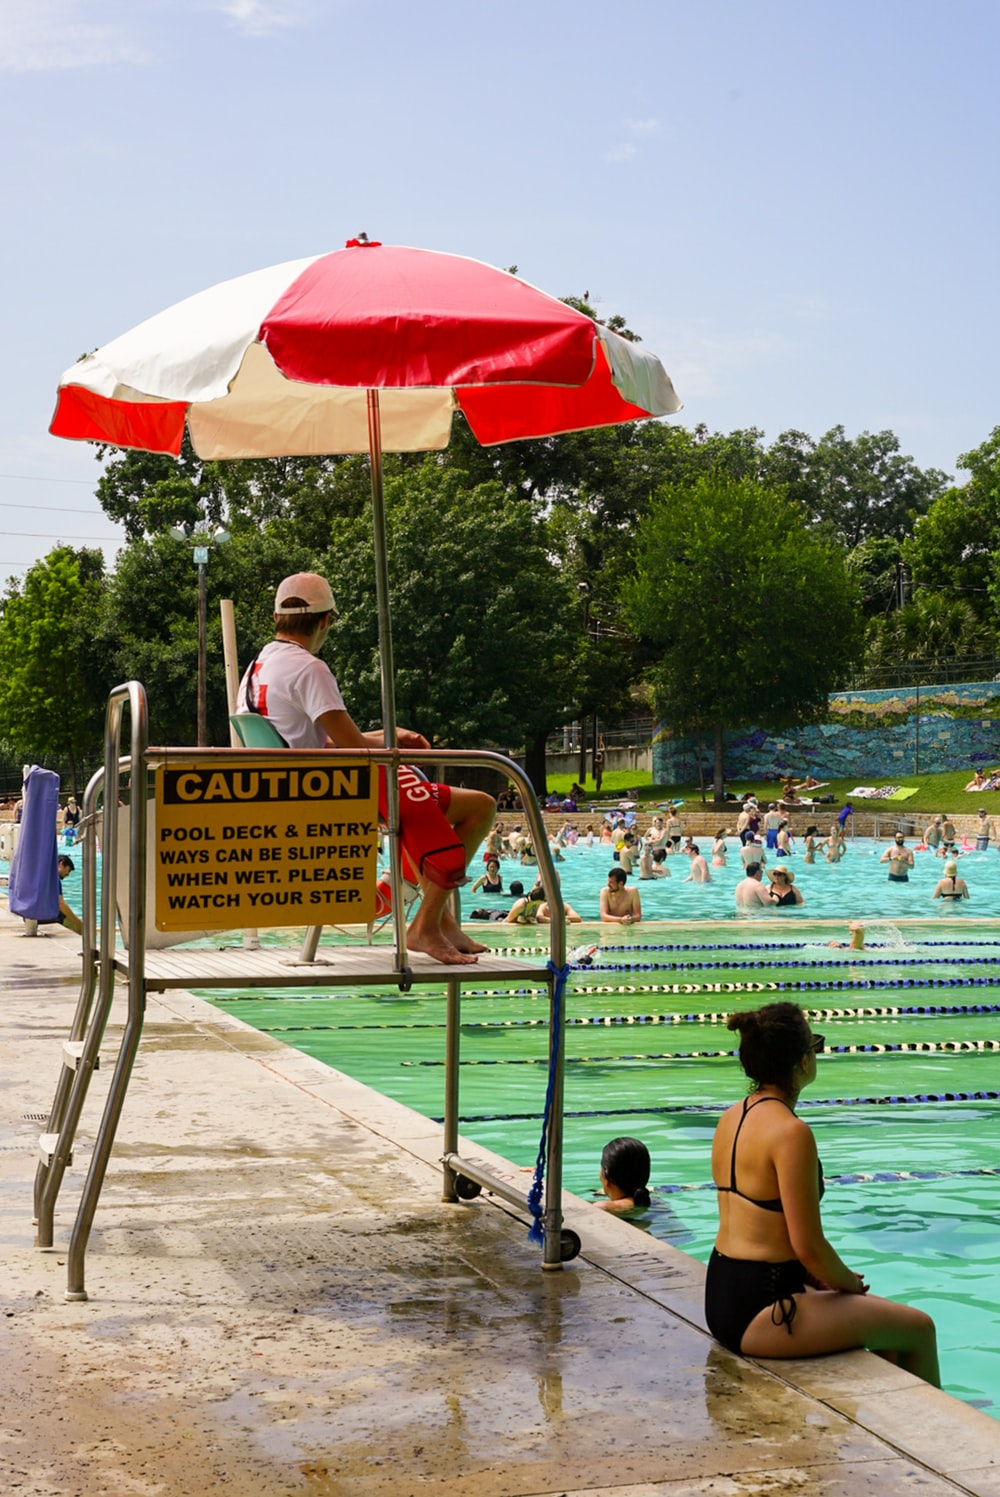 people swimming during daytime